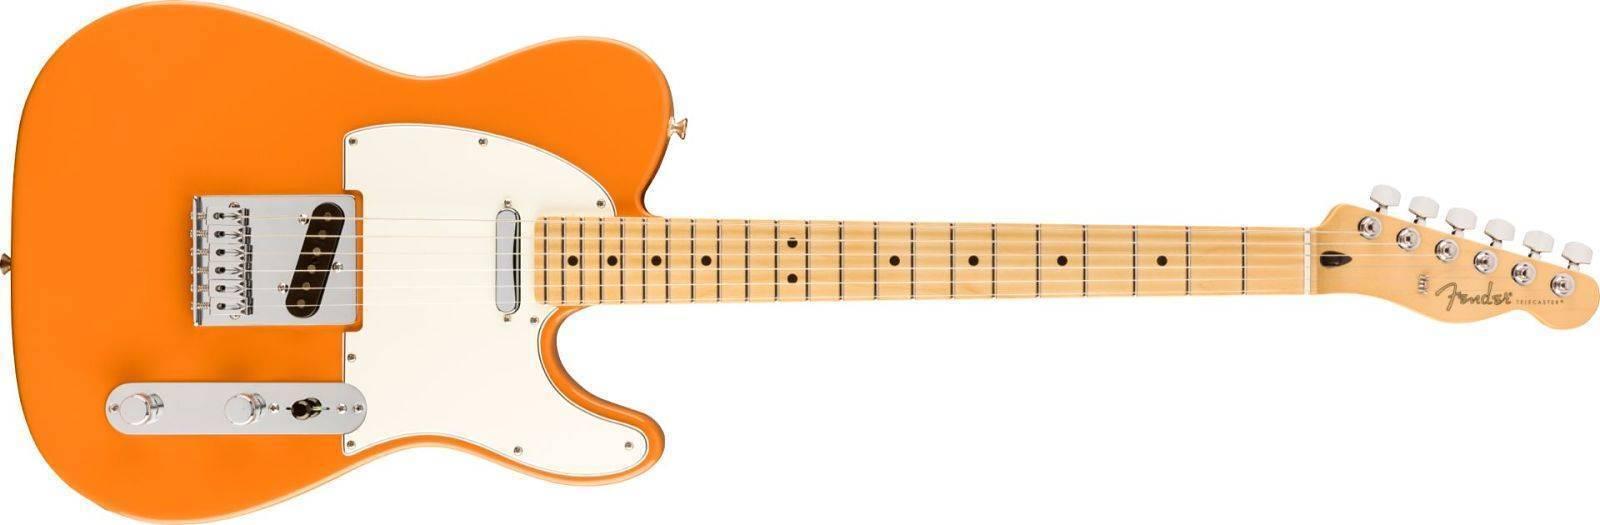 Guitarra Telecaster Player Telecaster Naranja Capri